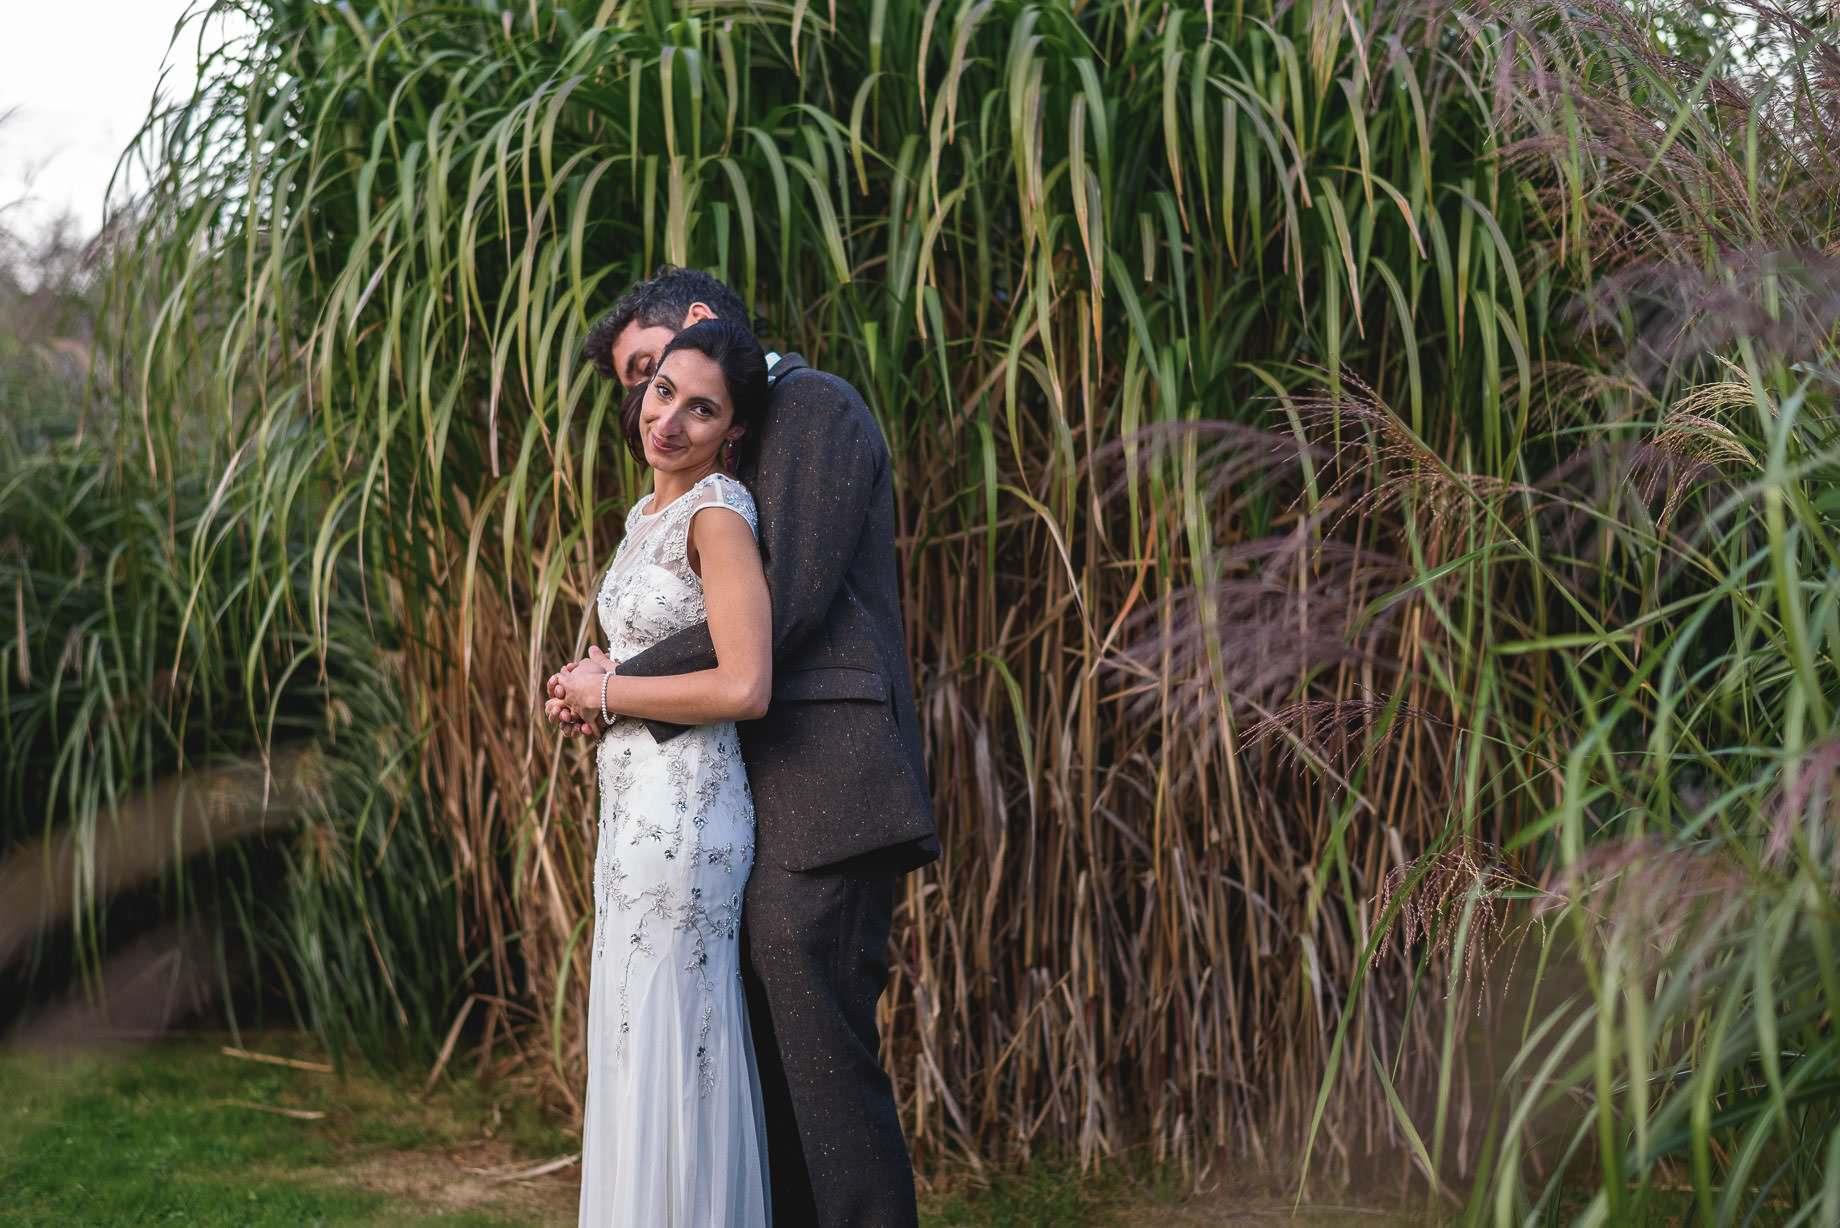 bury-court-barn-wedding-photography-guy-collier-photography-nadia-tom-106-of-184